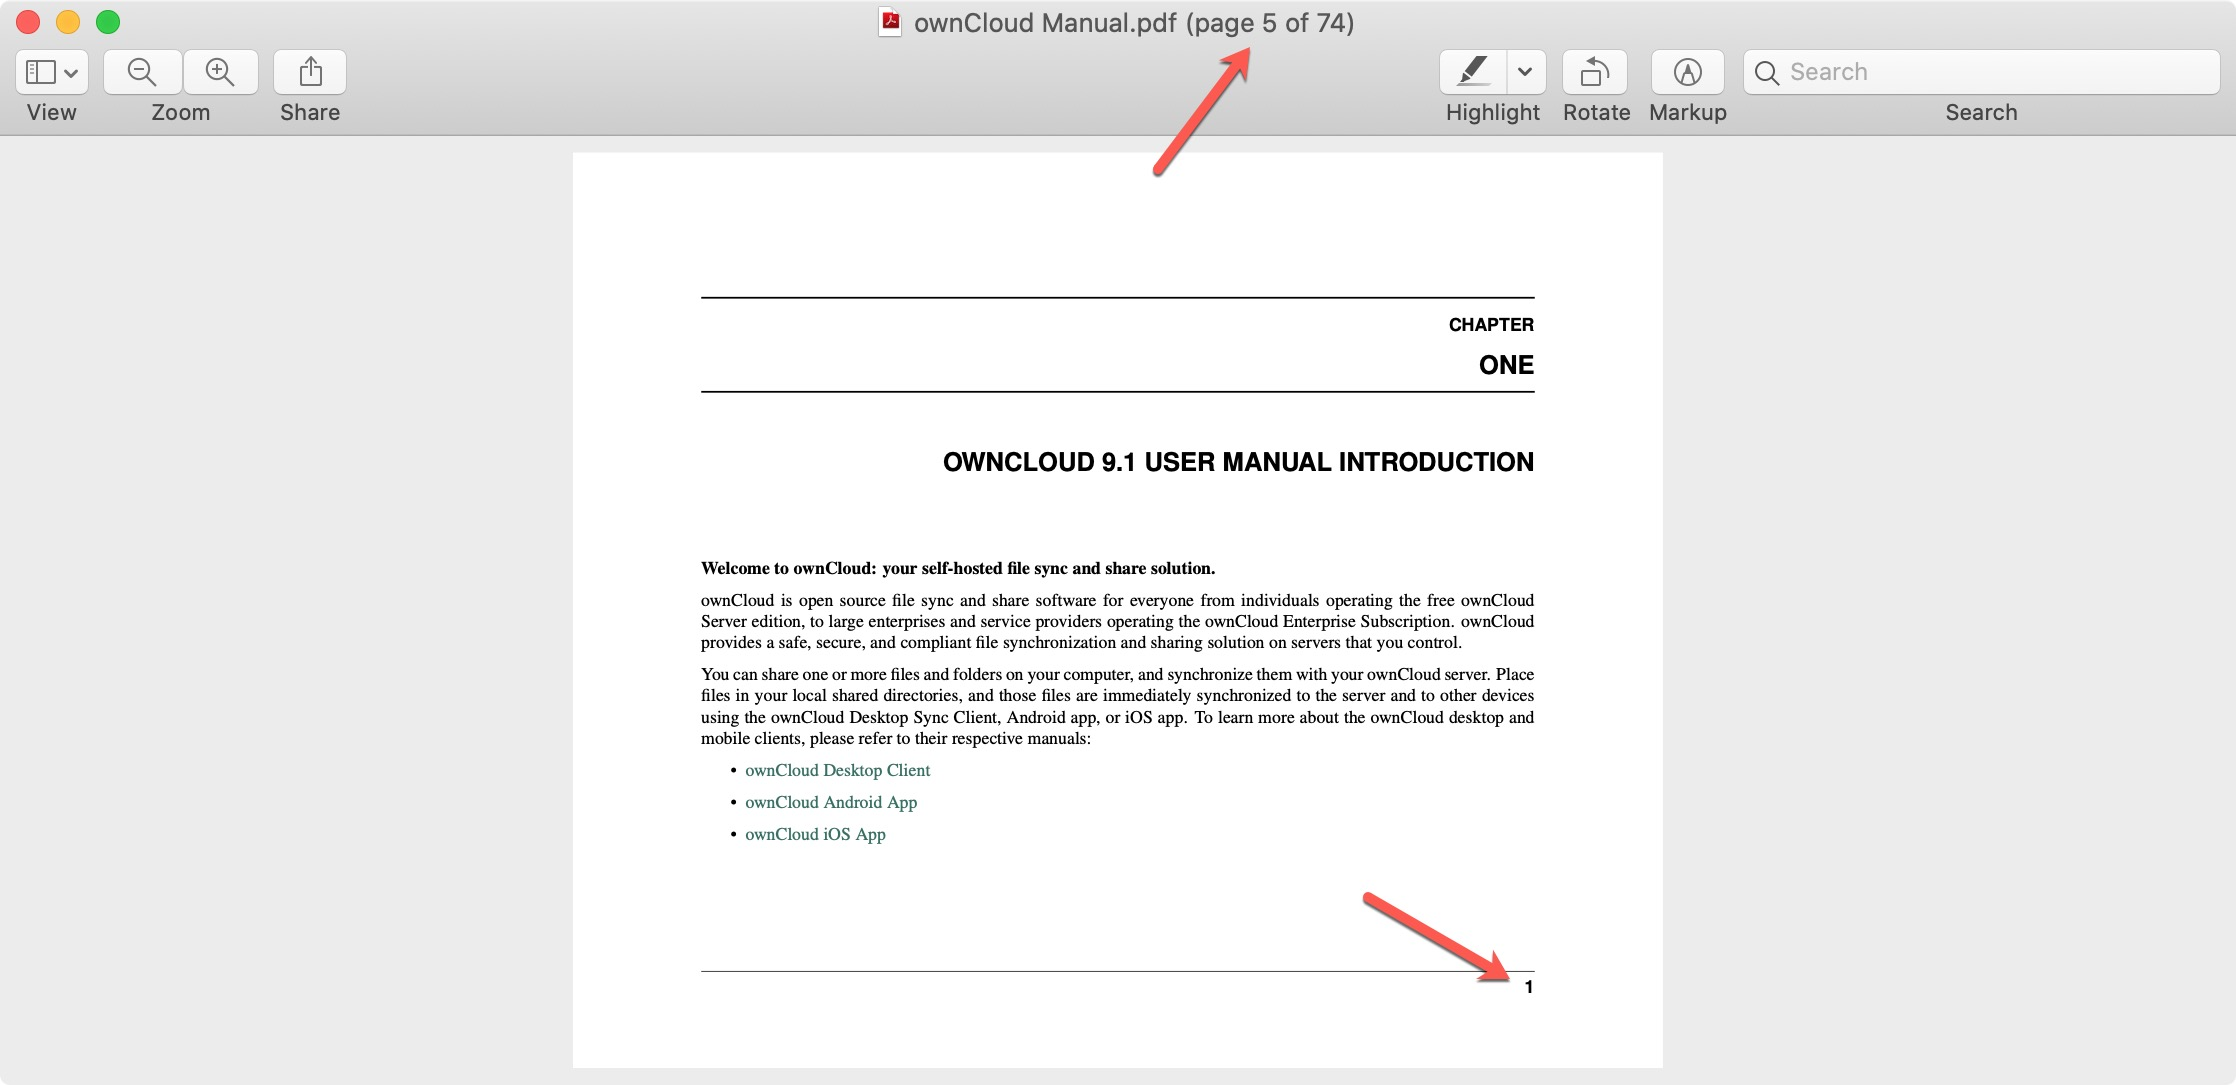 PDF Numbering Preview vs Actual